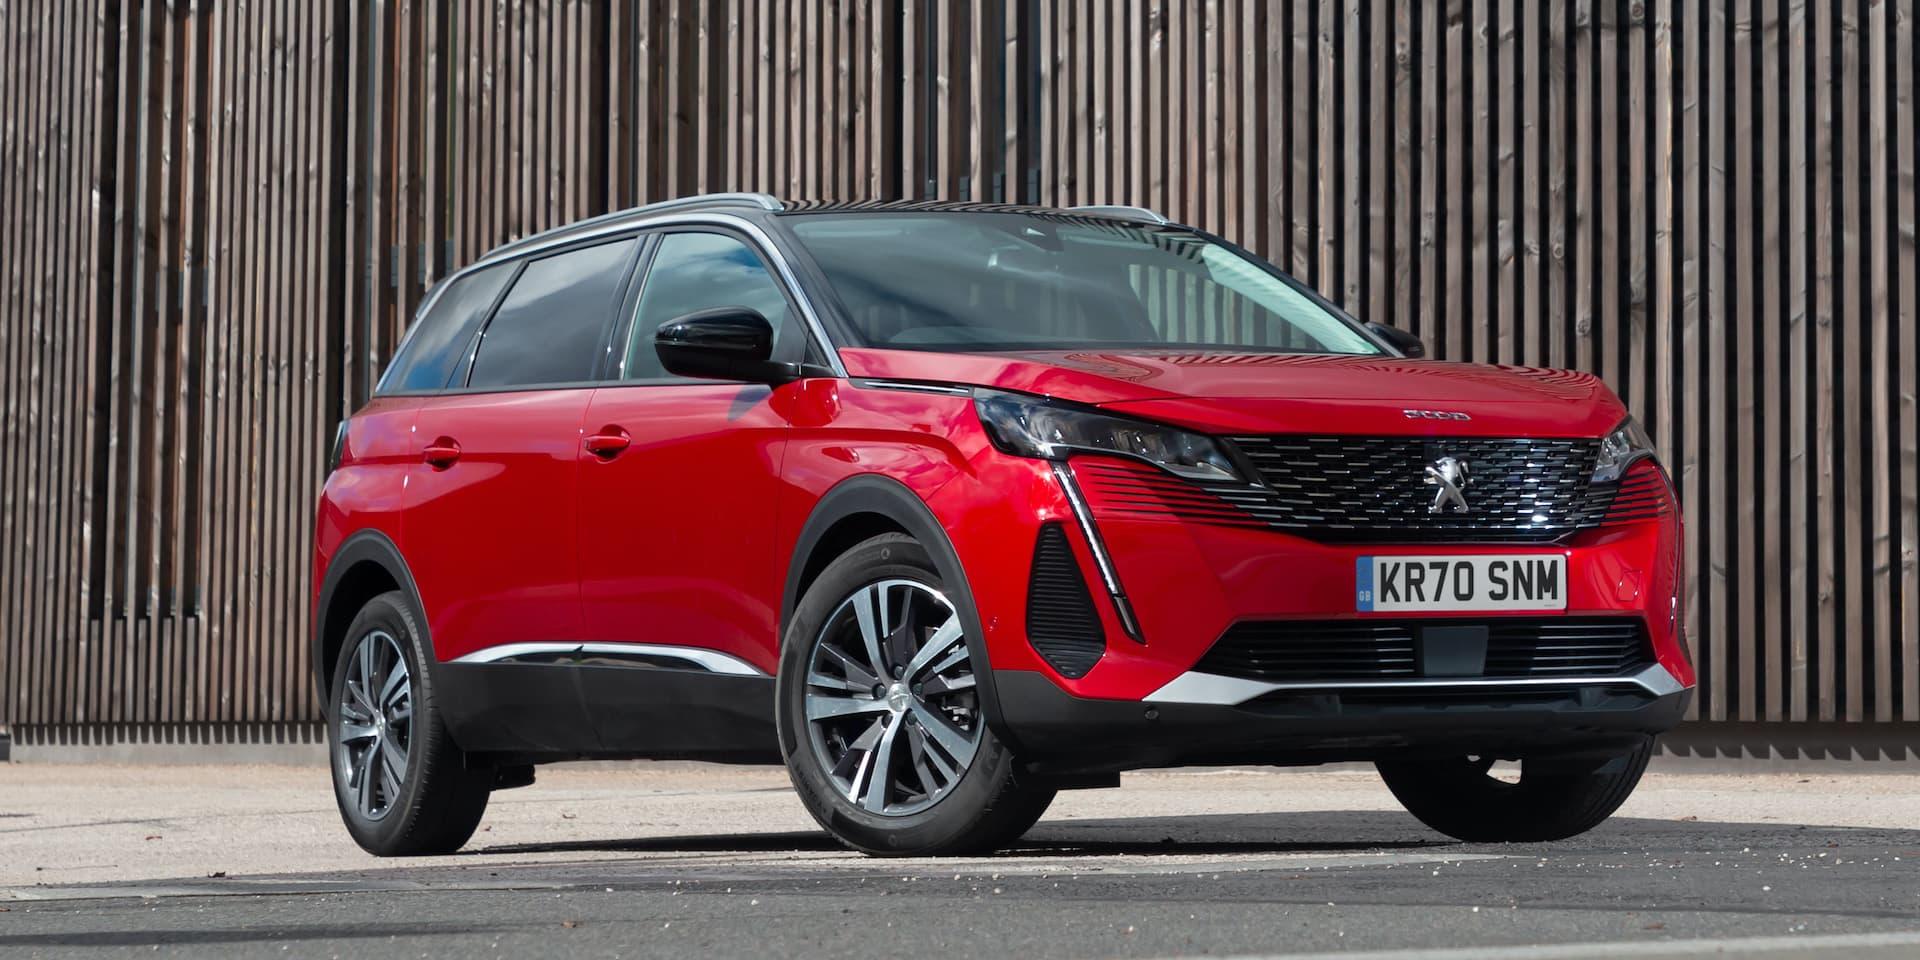 Peugeot 3008 facelift (2021) – Expert Rating